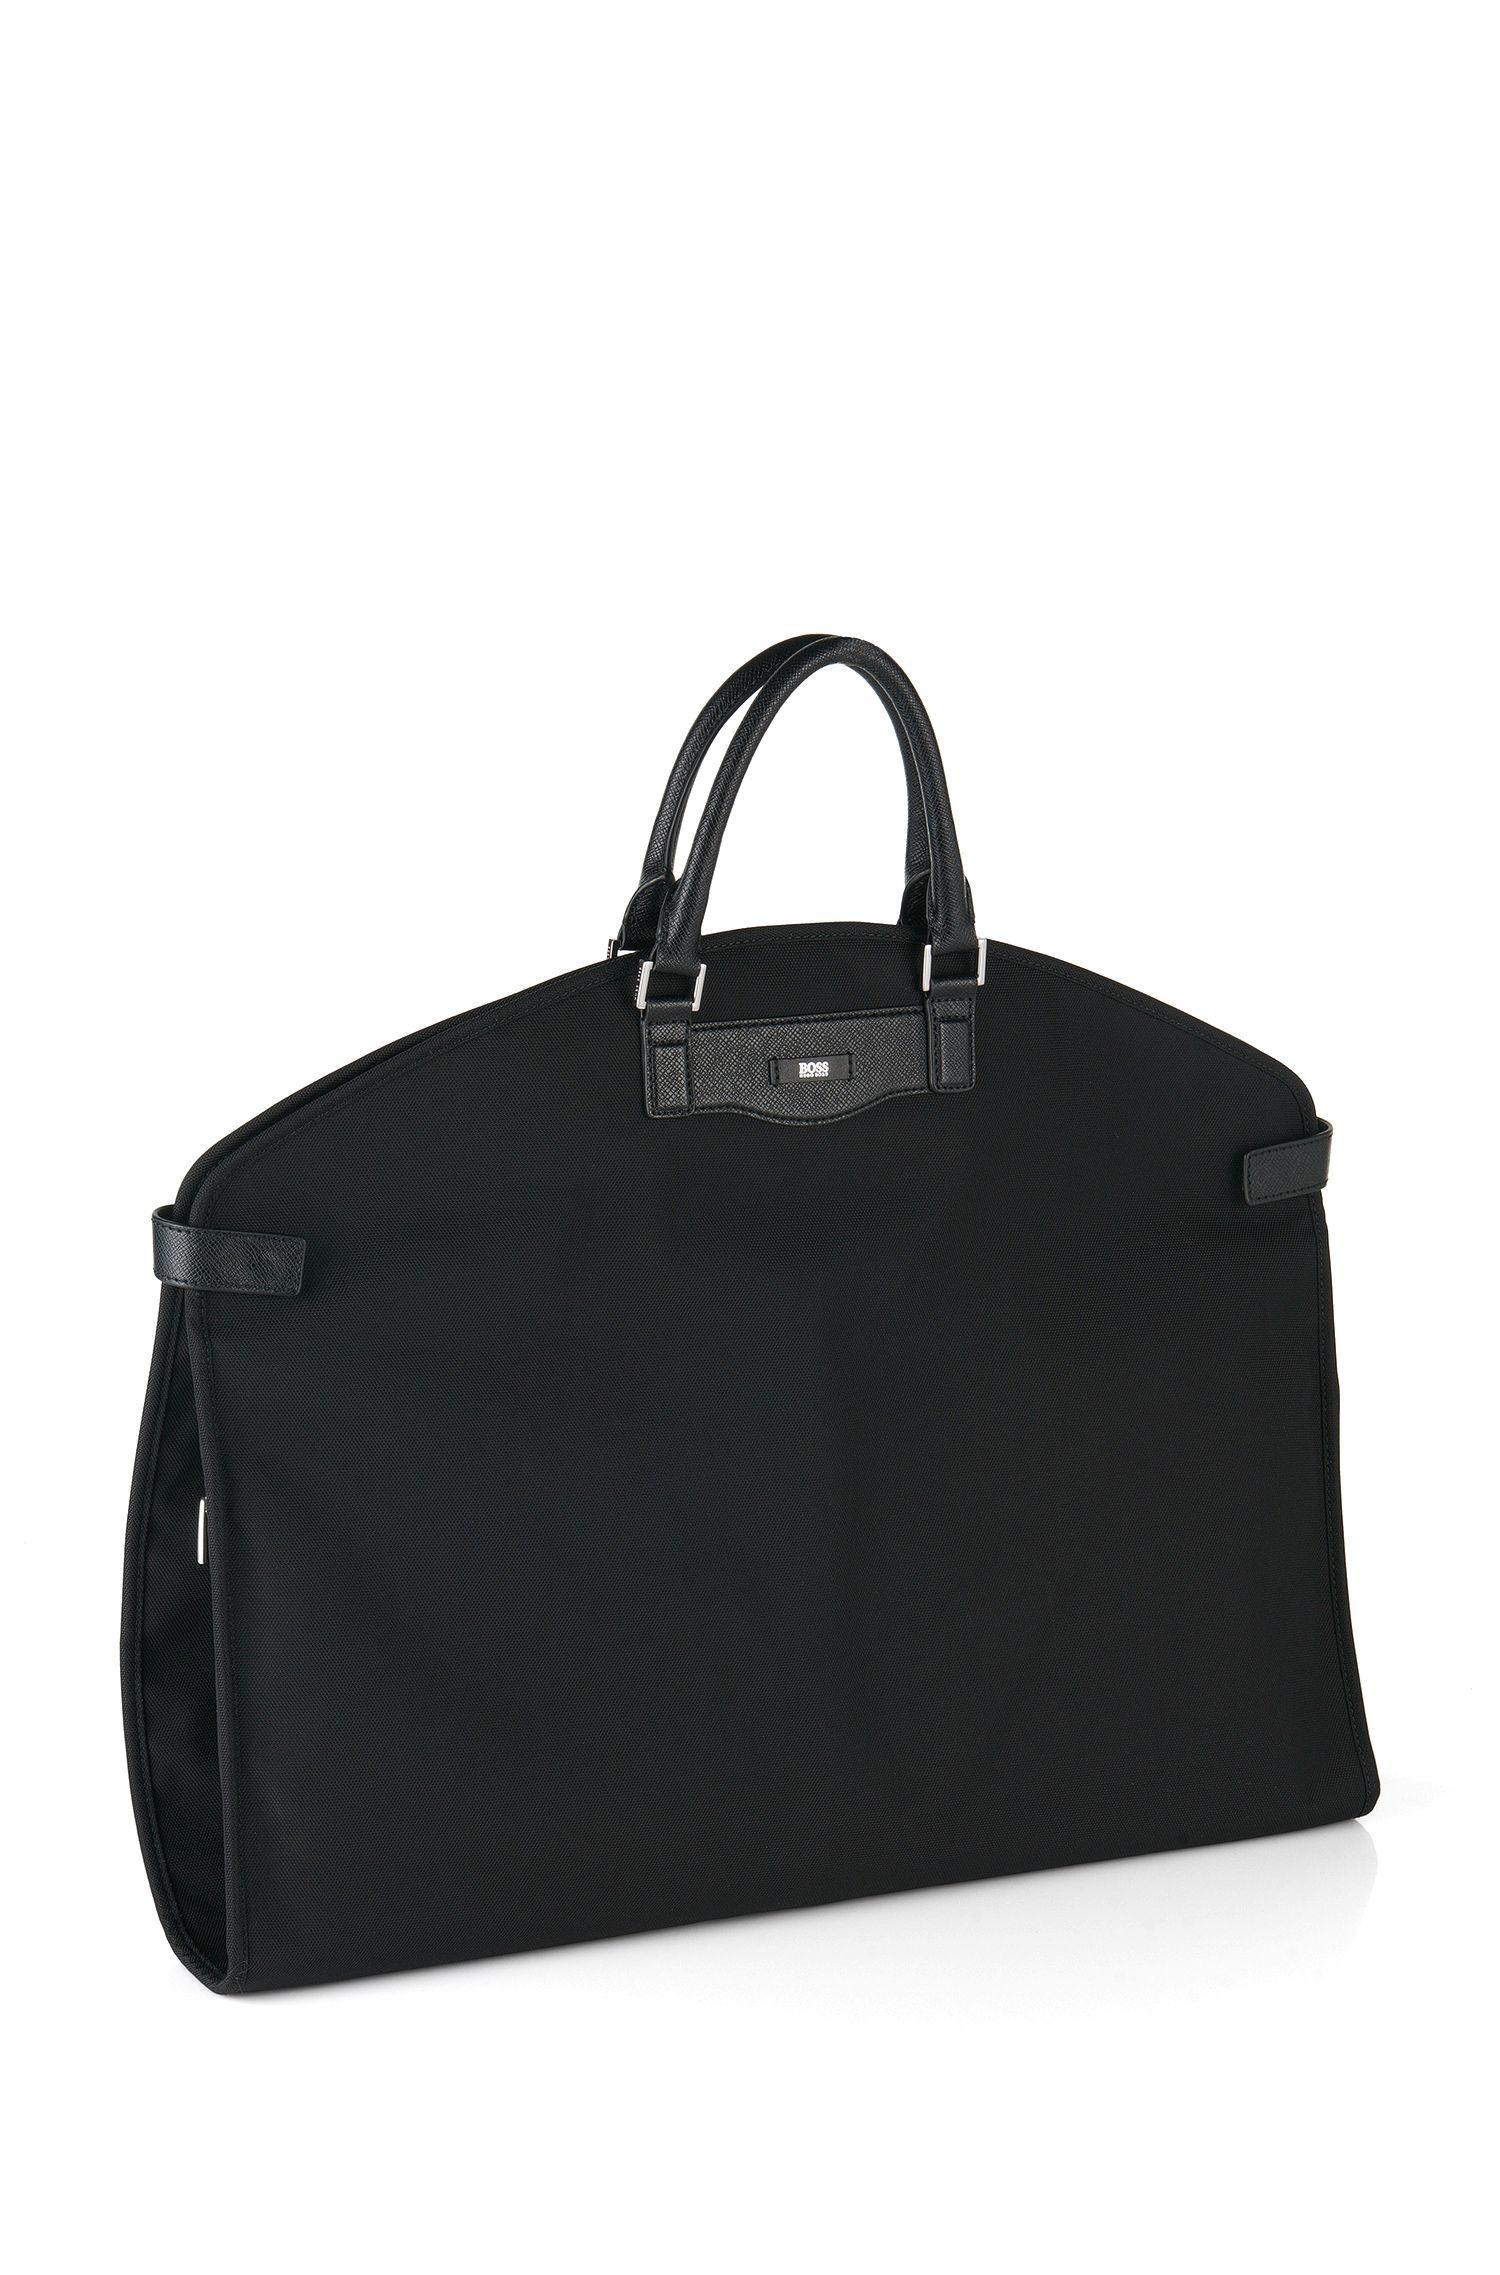 Garment bag with leather details: 'Signature L_Garment'